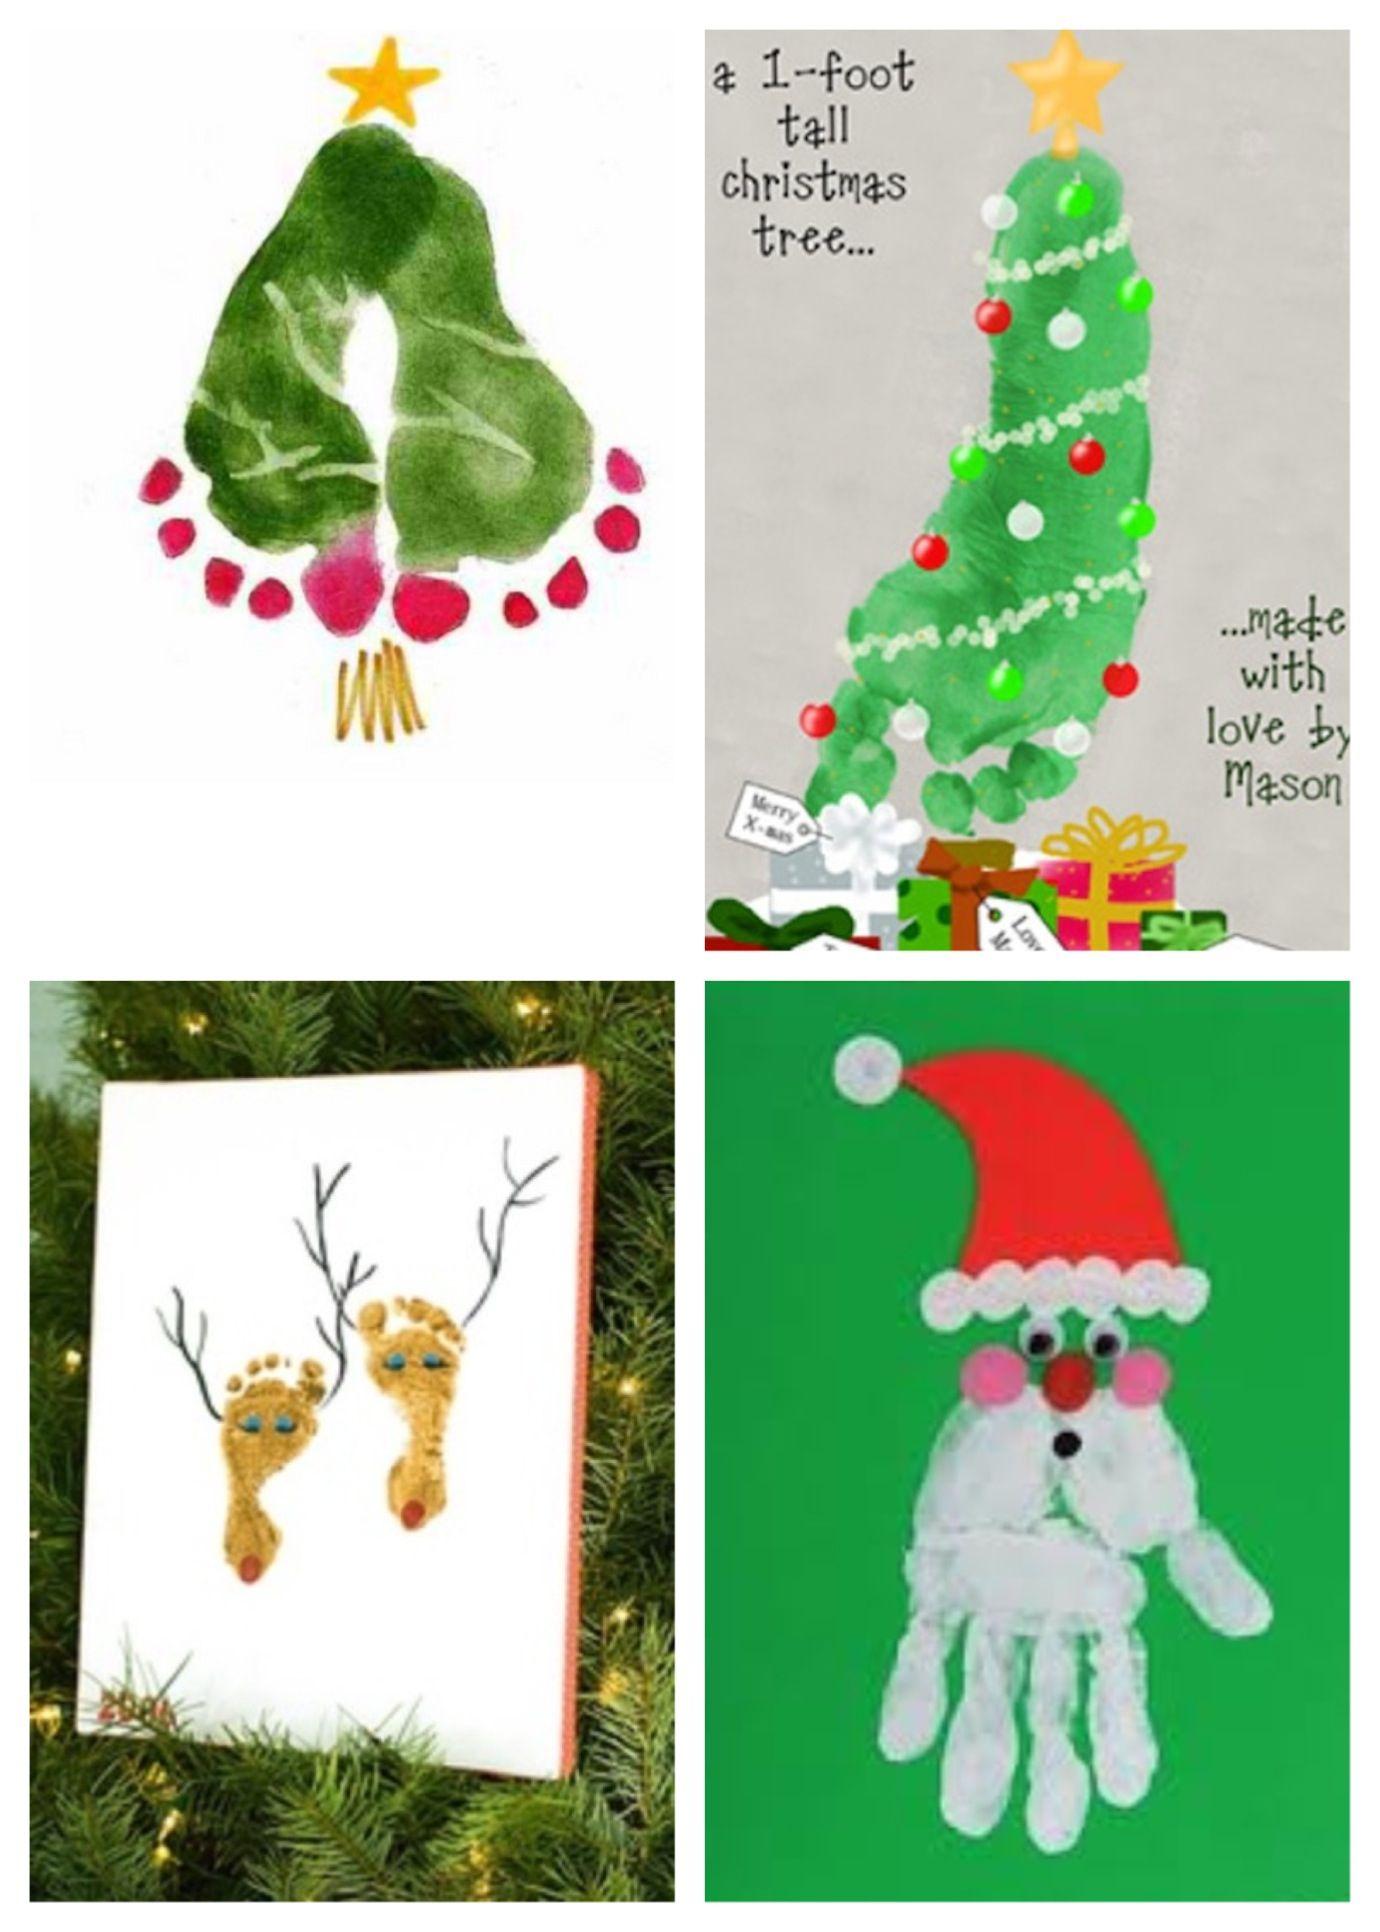 Christmas Handprint Art Ideas Like This Santa Too Double Foot Tree Is Cue Manualidades Navidad Infantil Manualidades Navidenas Tarjetas De Navidad Para Ninos